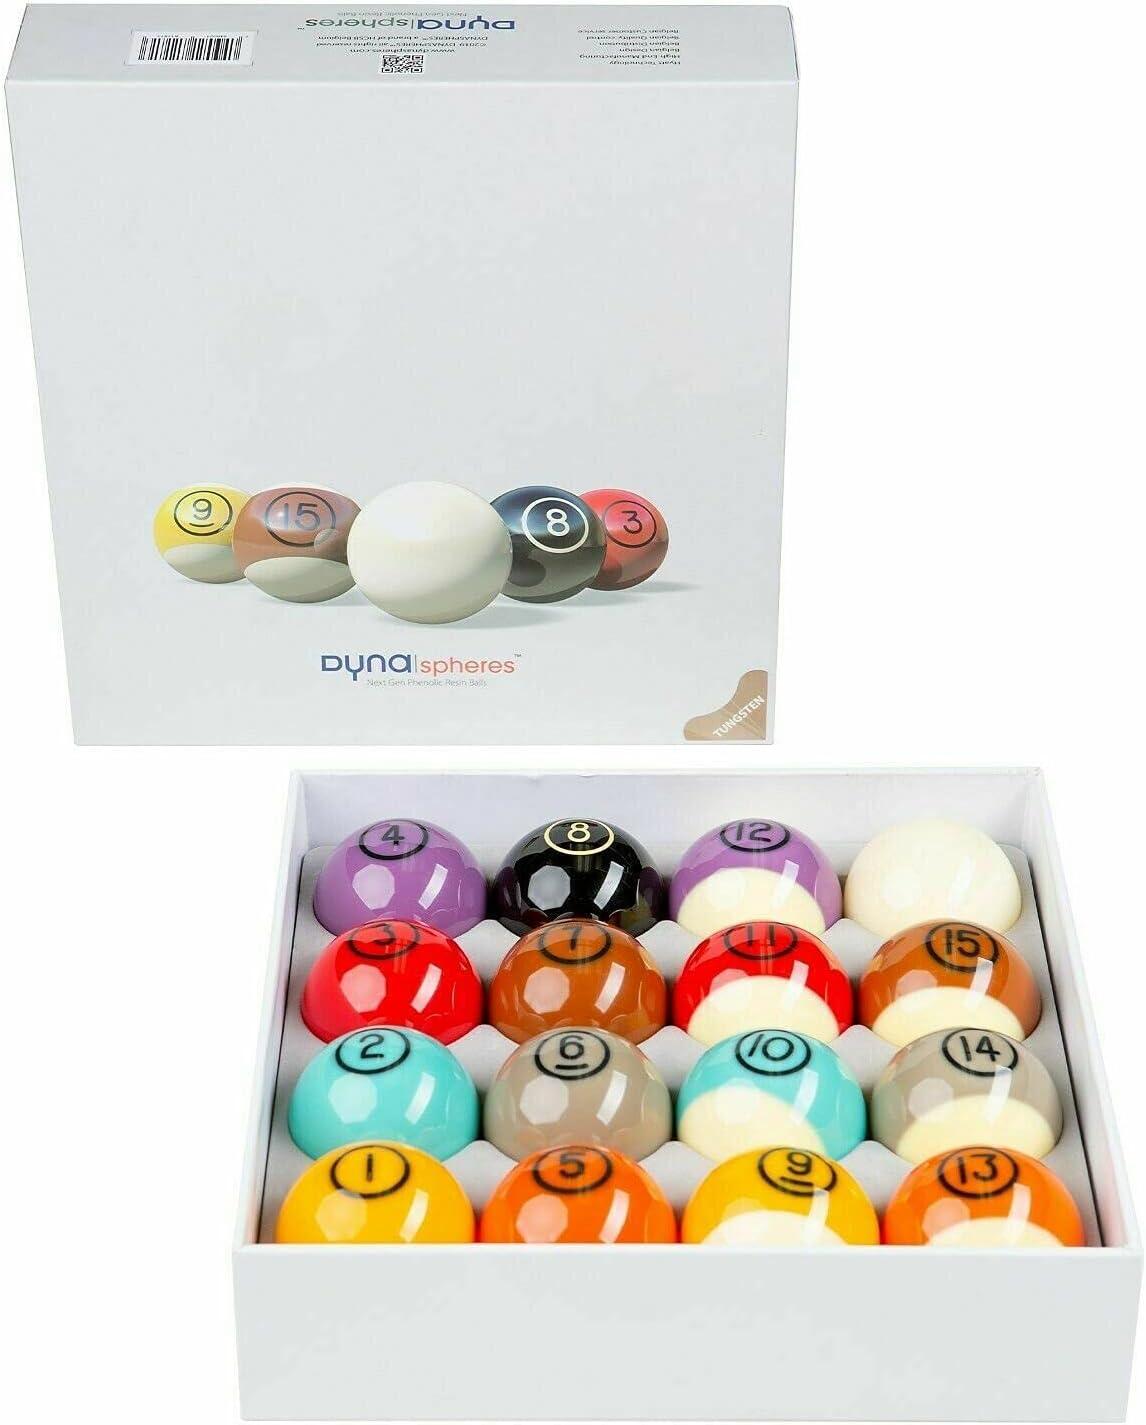 Low price Uncommon Tungsten 2-1 4 in. Belgian Billiards Pool Free Shipping New • Balls Regin